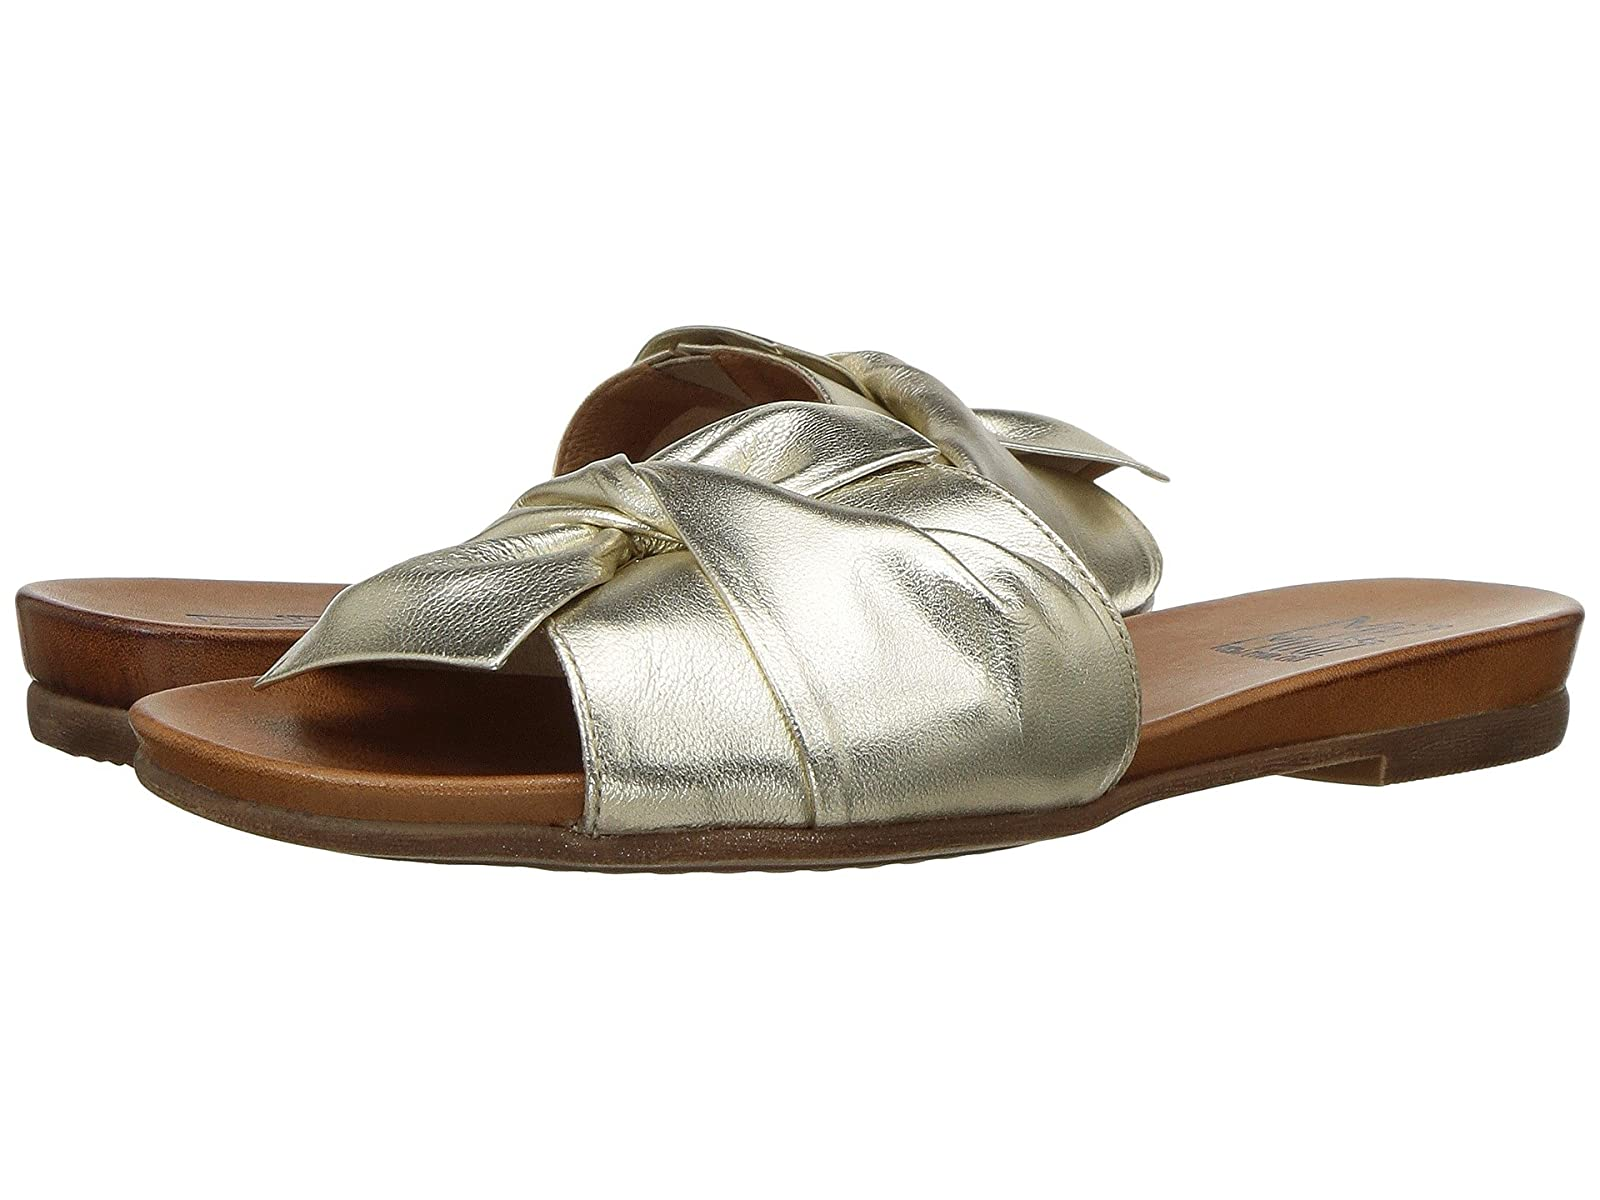 Miz Mooz AngelinaAtmospheric grades have affordable shoes